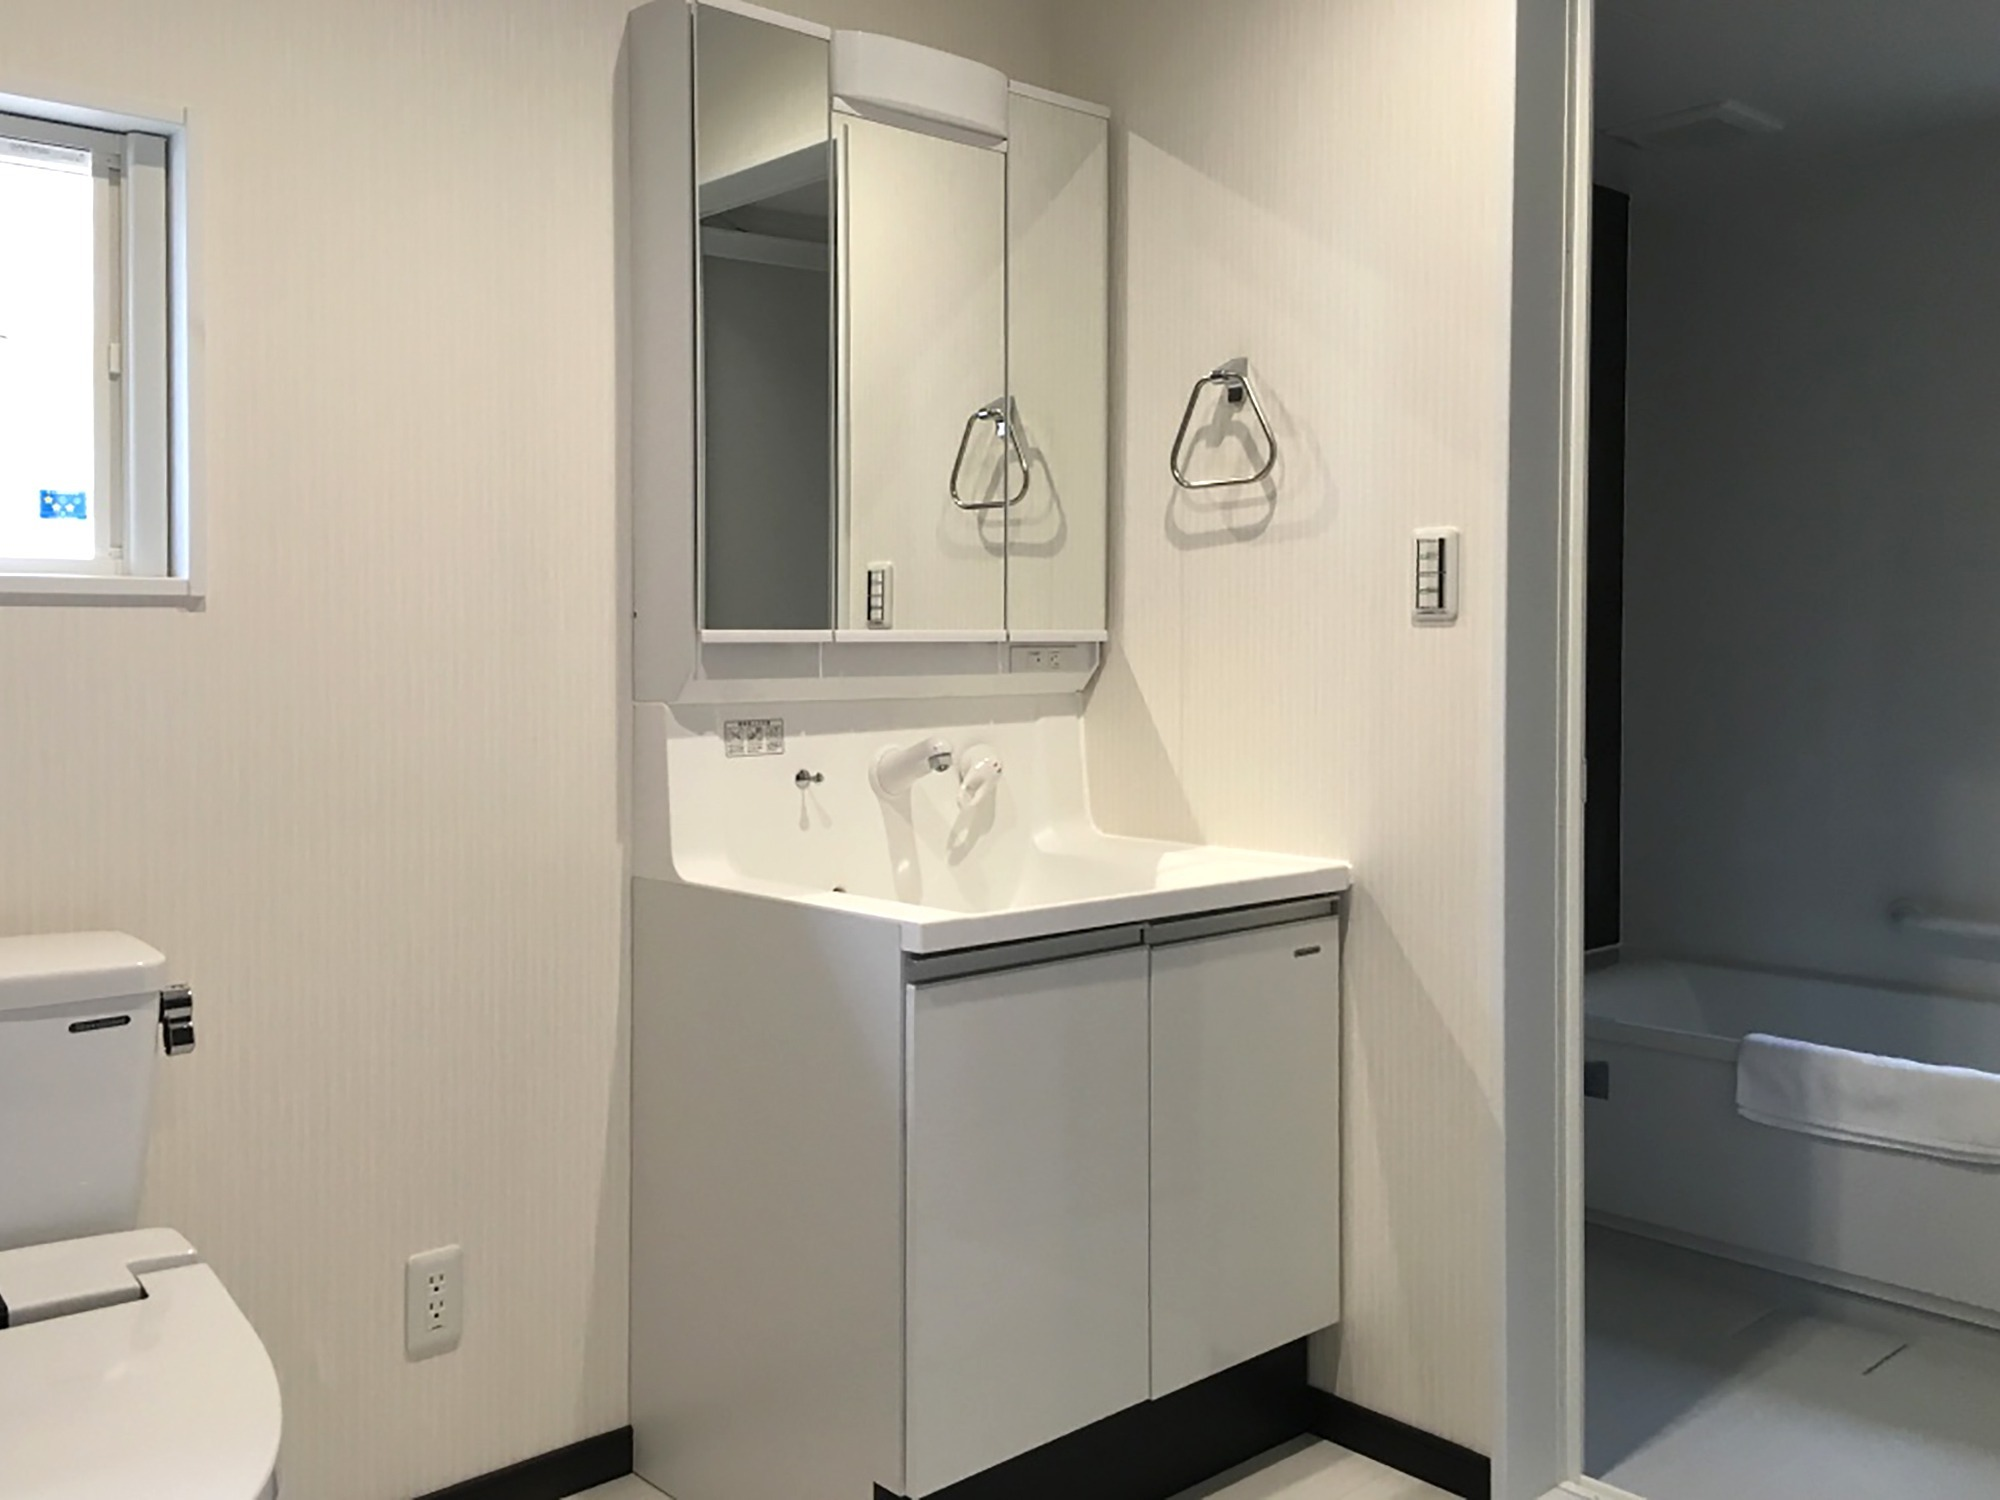 Condor House 2F 浴室、化粧室、トイレ